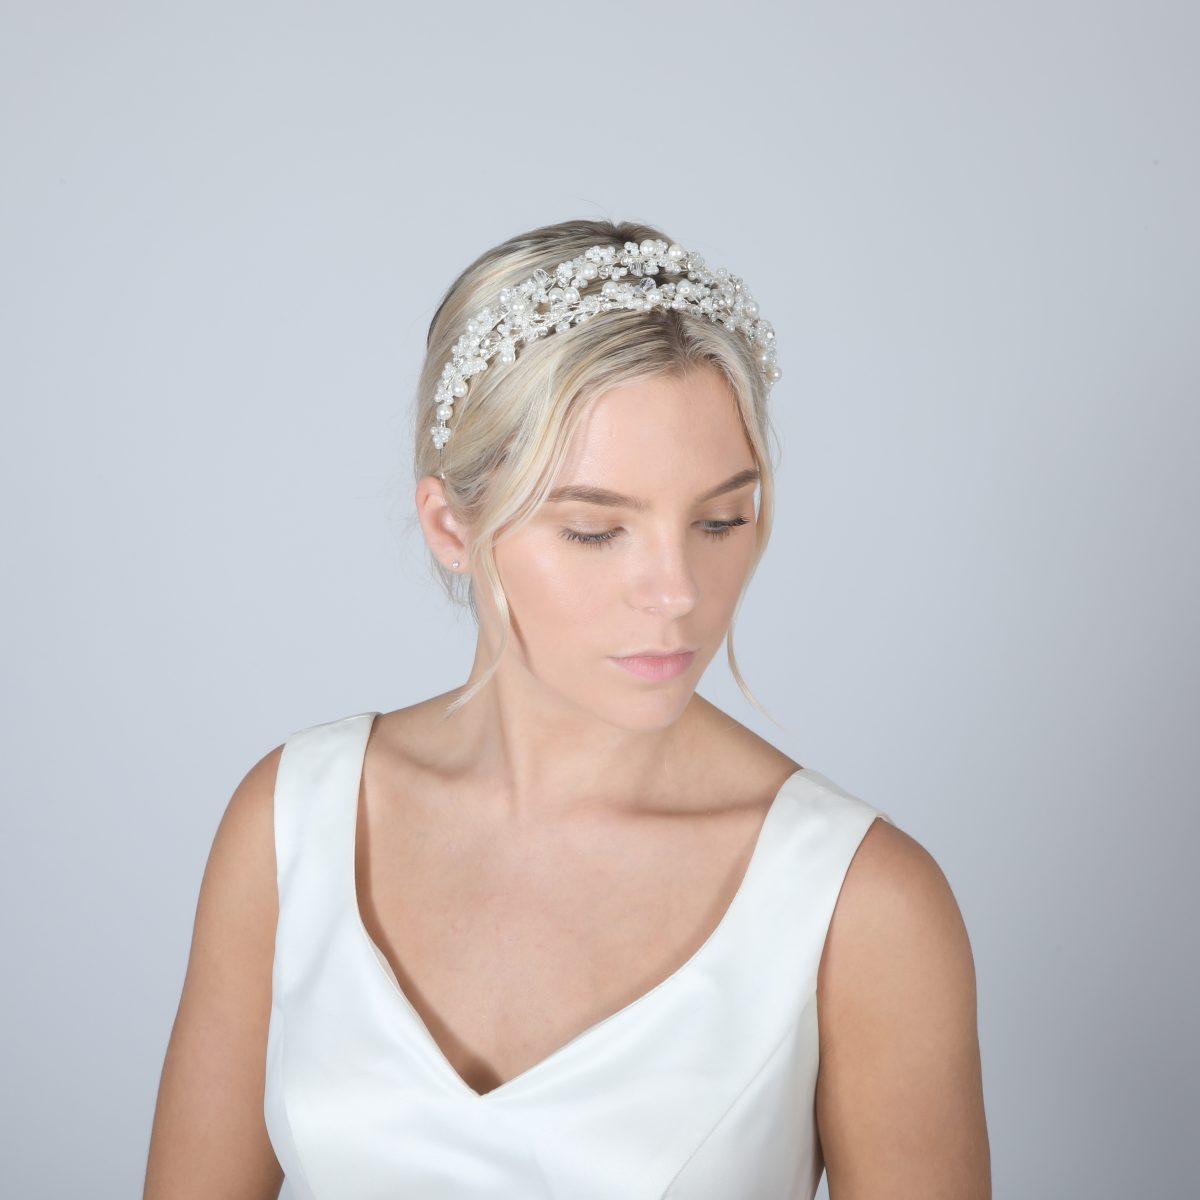 Perfect Bridal Tiara - PBT5023 2